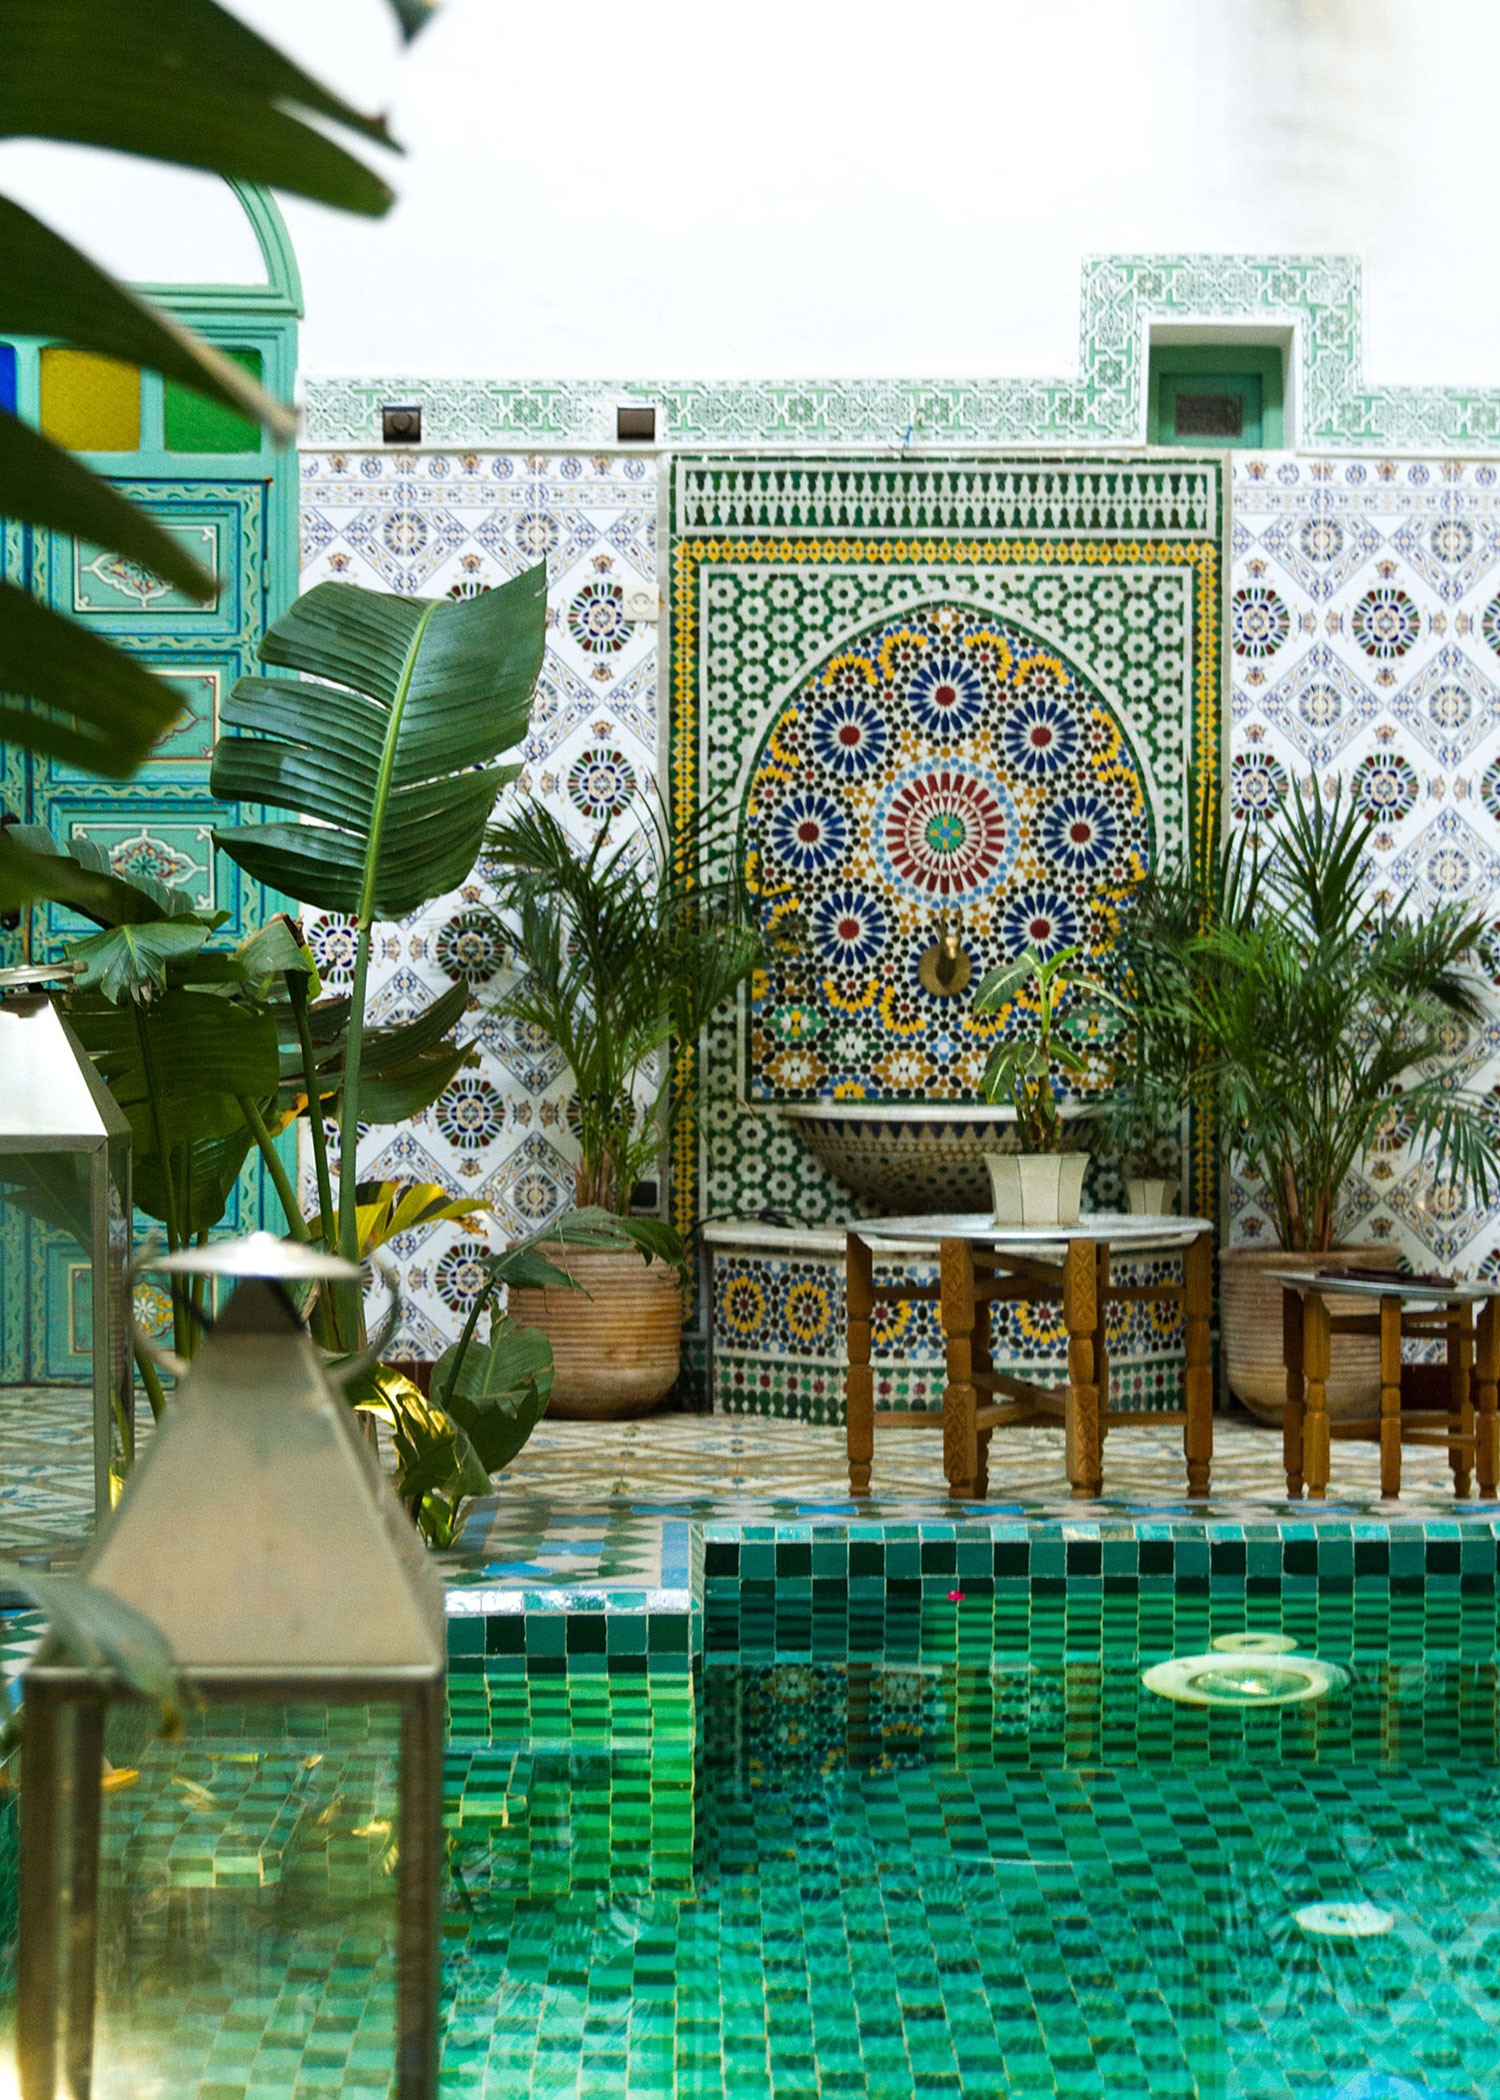 08_NOMNOM_Reise_Marrakech_Riad_BE.jpg